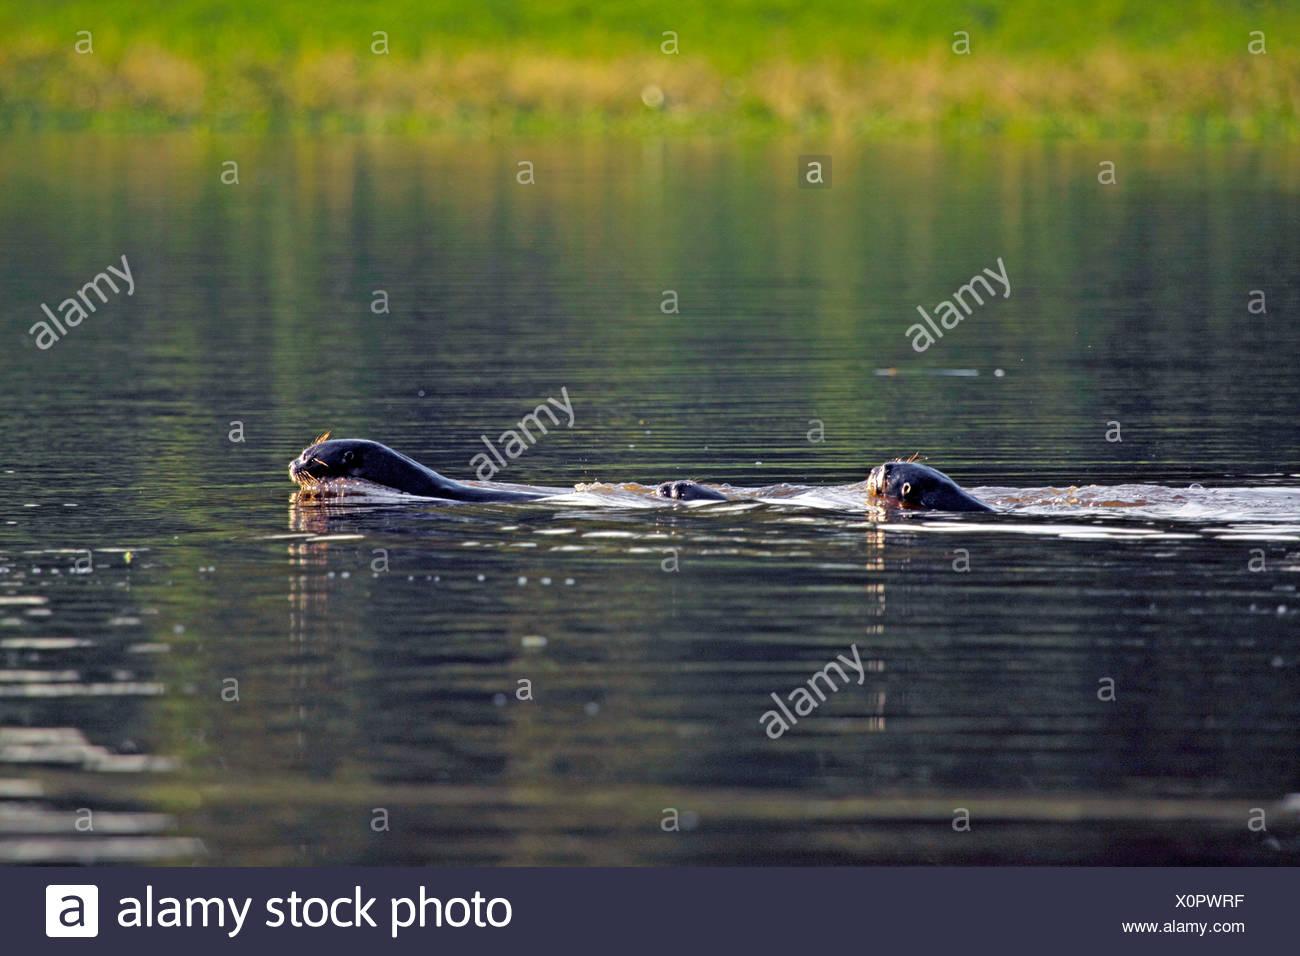 giant otter (Pteronura brasiliensis), family swimming, Peru, Loreto, Pacaya Samiria National Park - Stock Image